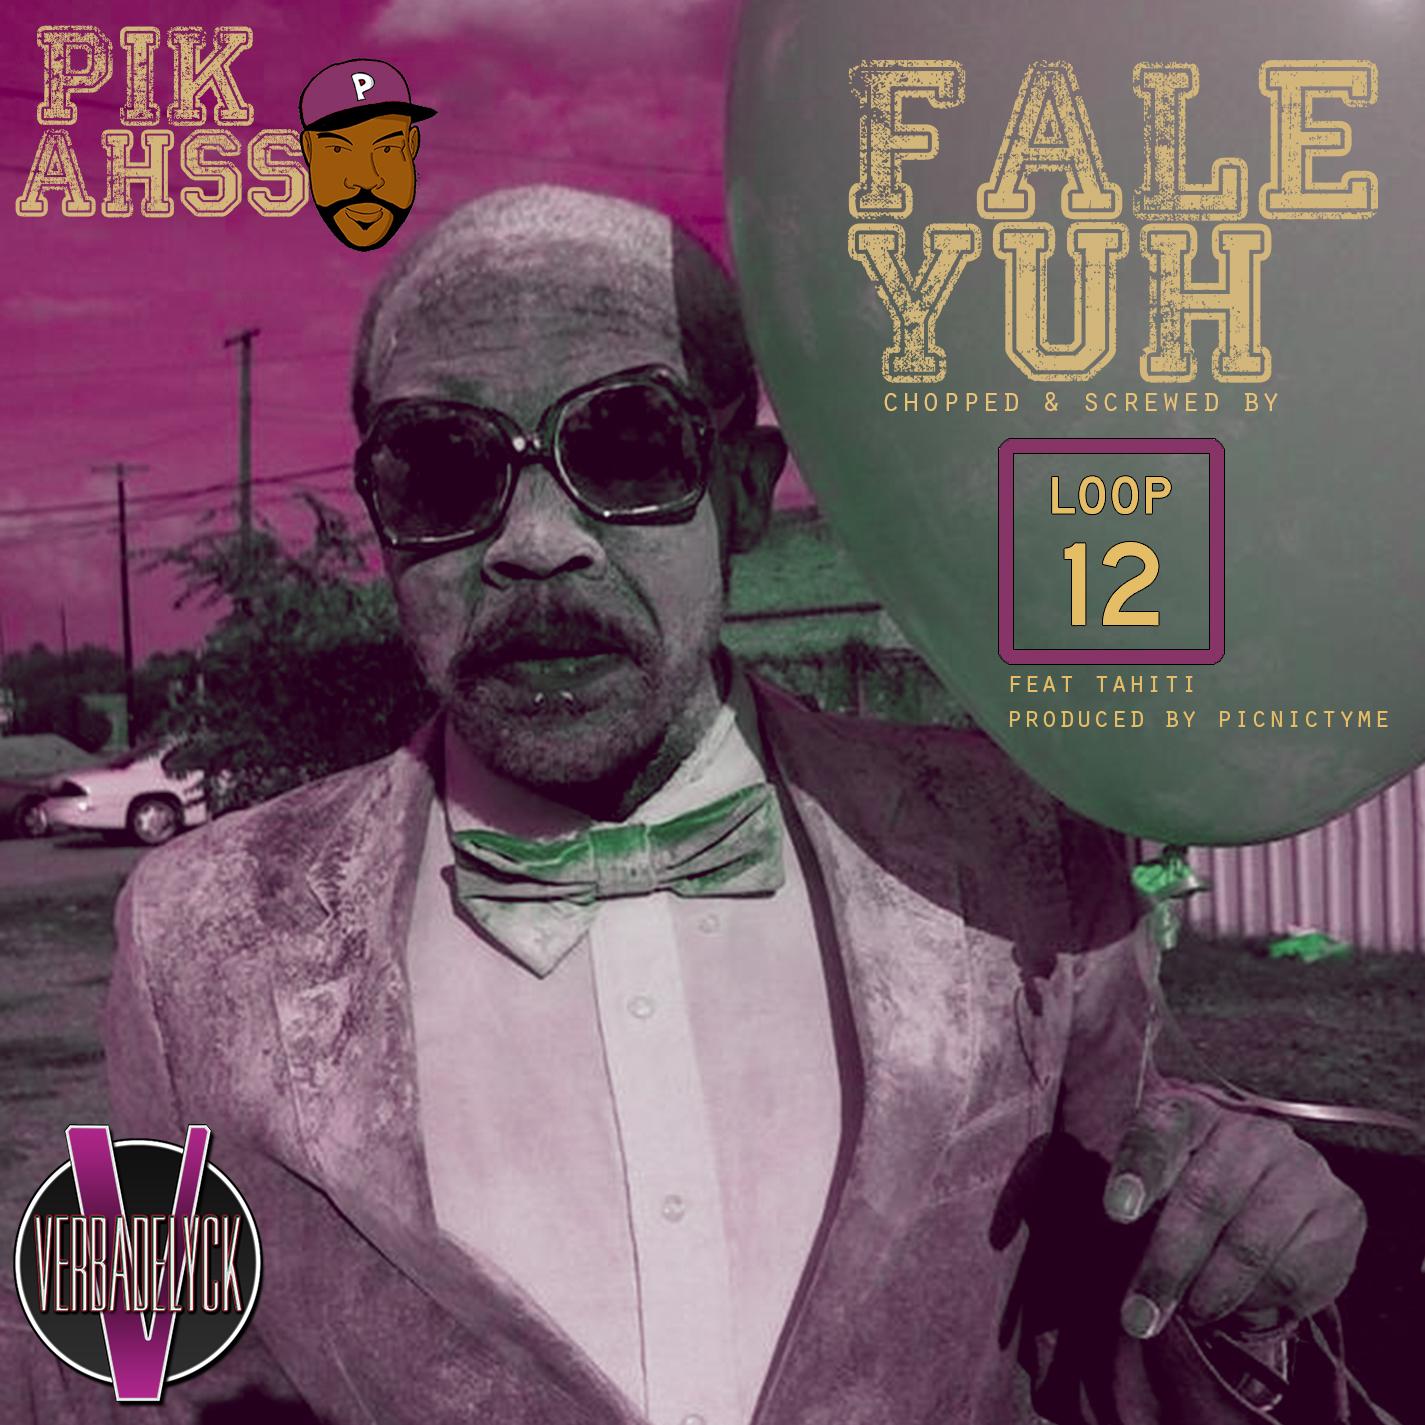 PiKaHsSo Faleyuh LOOP 12 MiX / PiKaHsSo's Discography